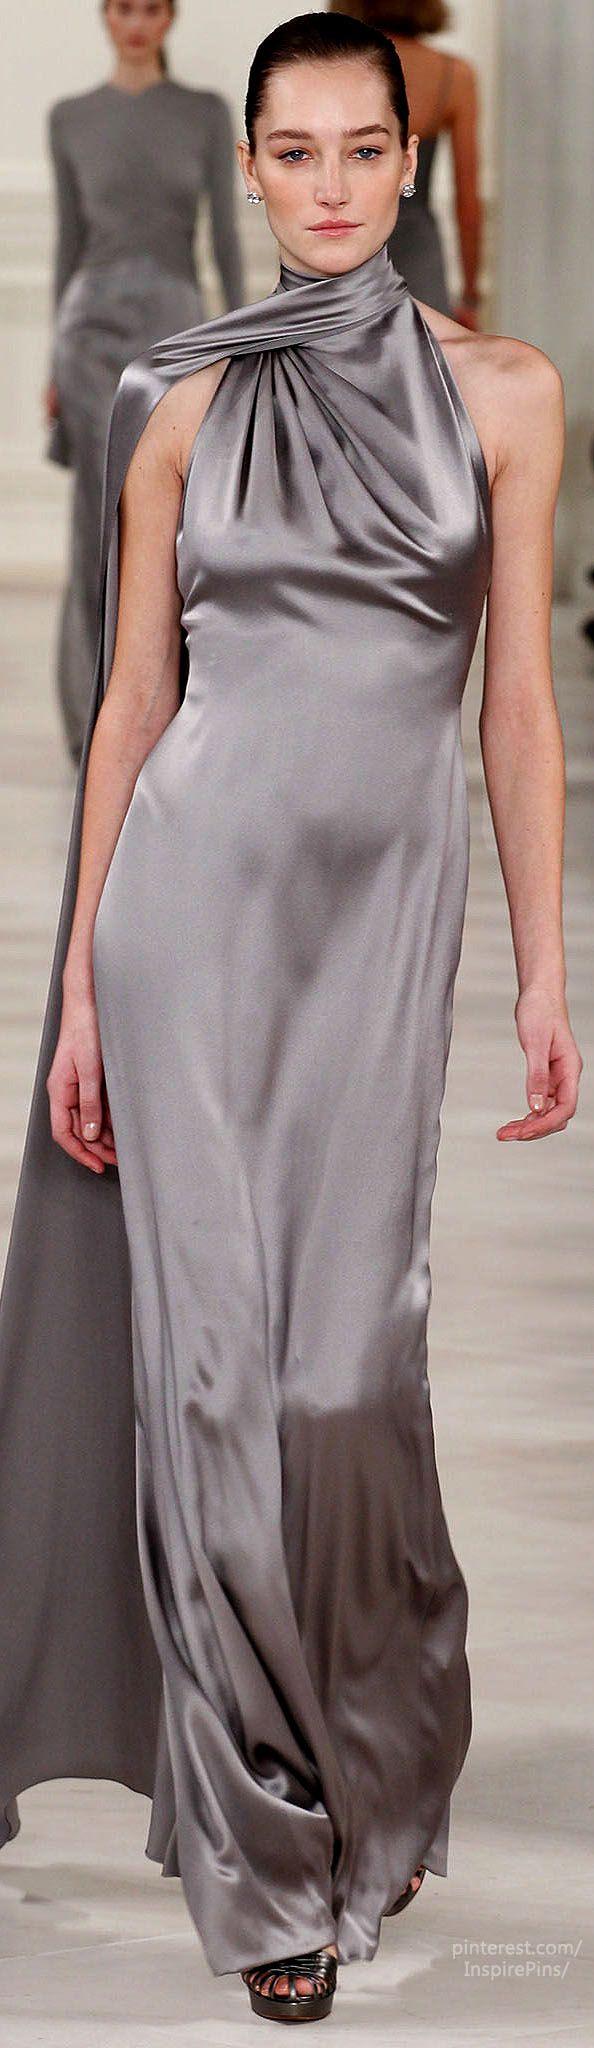 Ralph Lauren FW2014/LA celebrity Fashion Stylist Adrien Rabago is now offering personal styling appointments